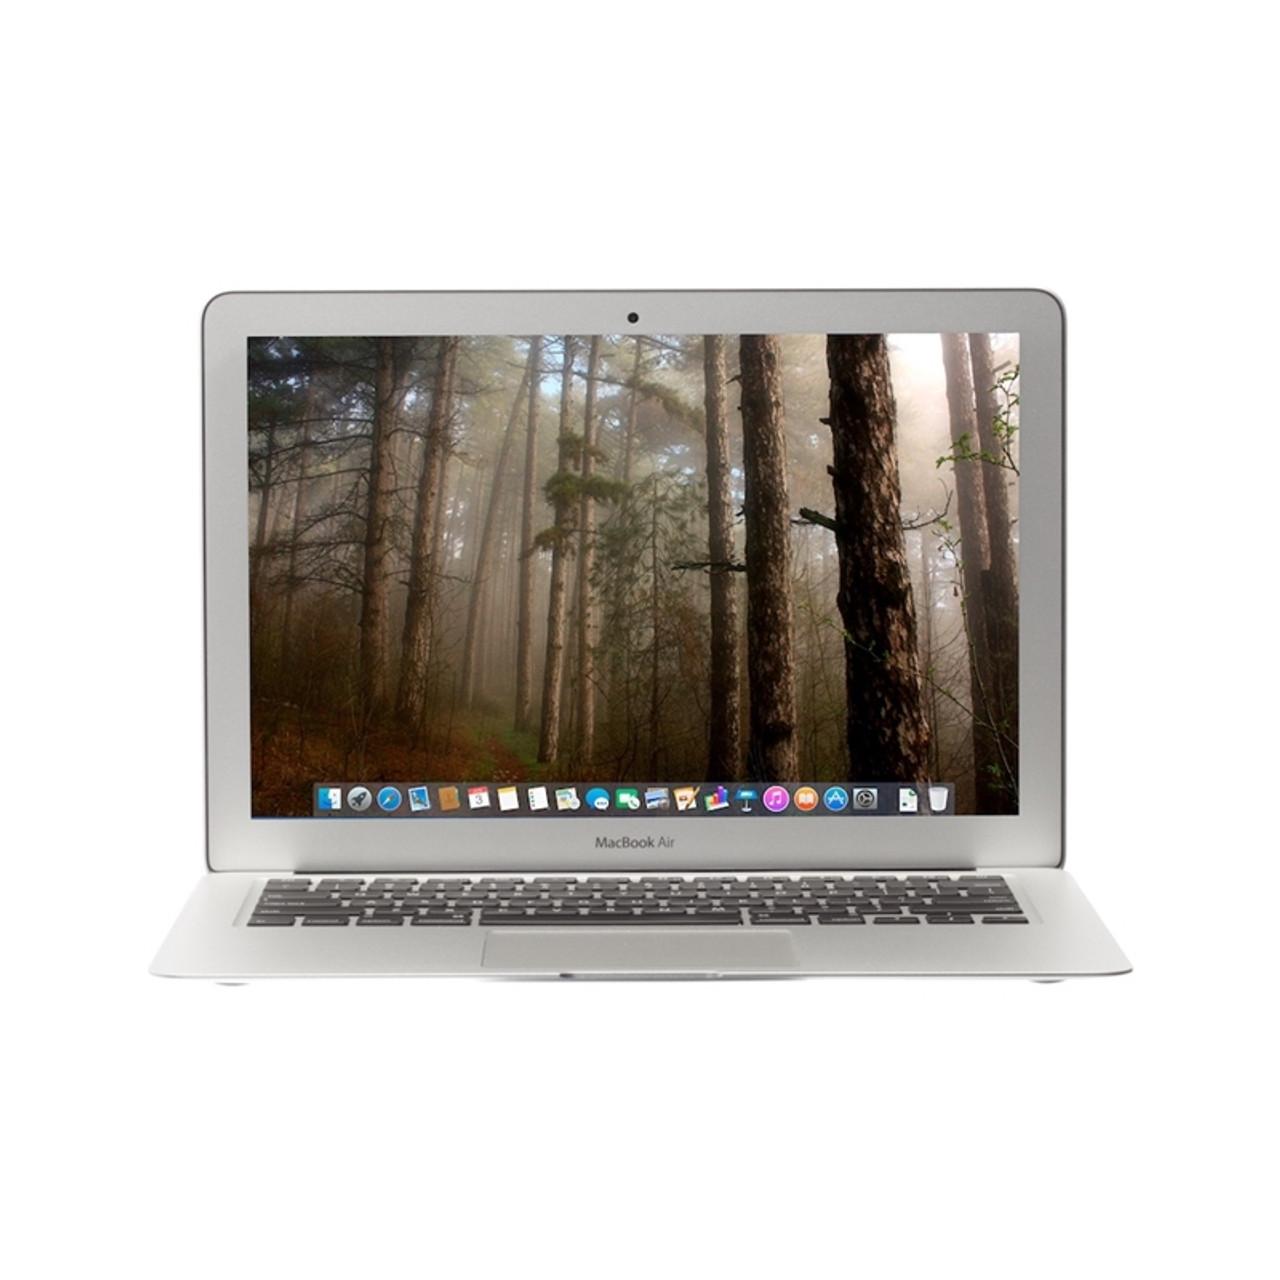 Apple MacBook Air 13-inch 1 7GHz Core i5 (Mid 2011) MC966LL/A - Excellent